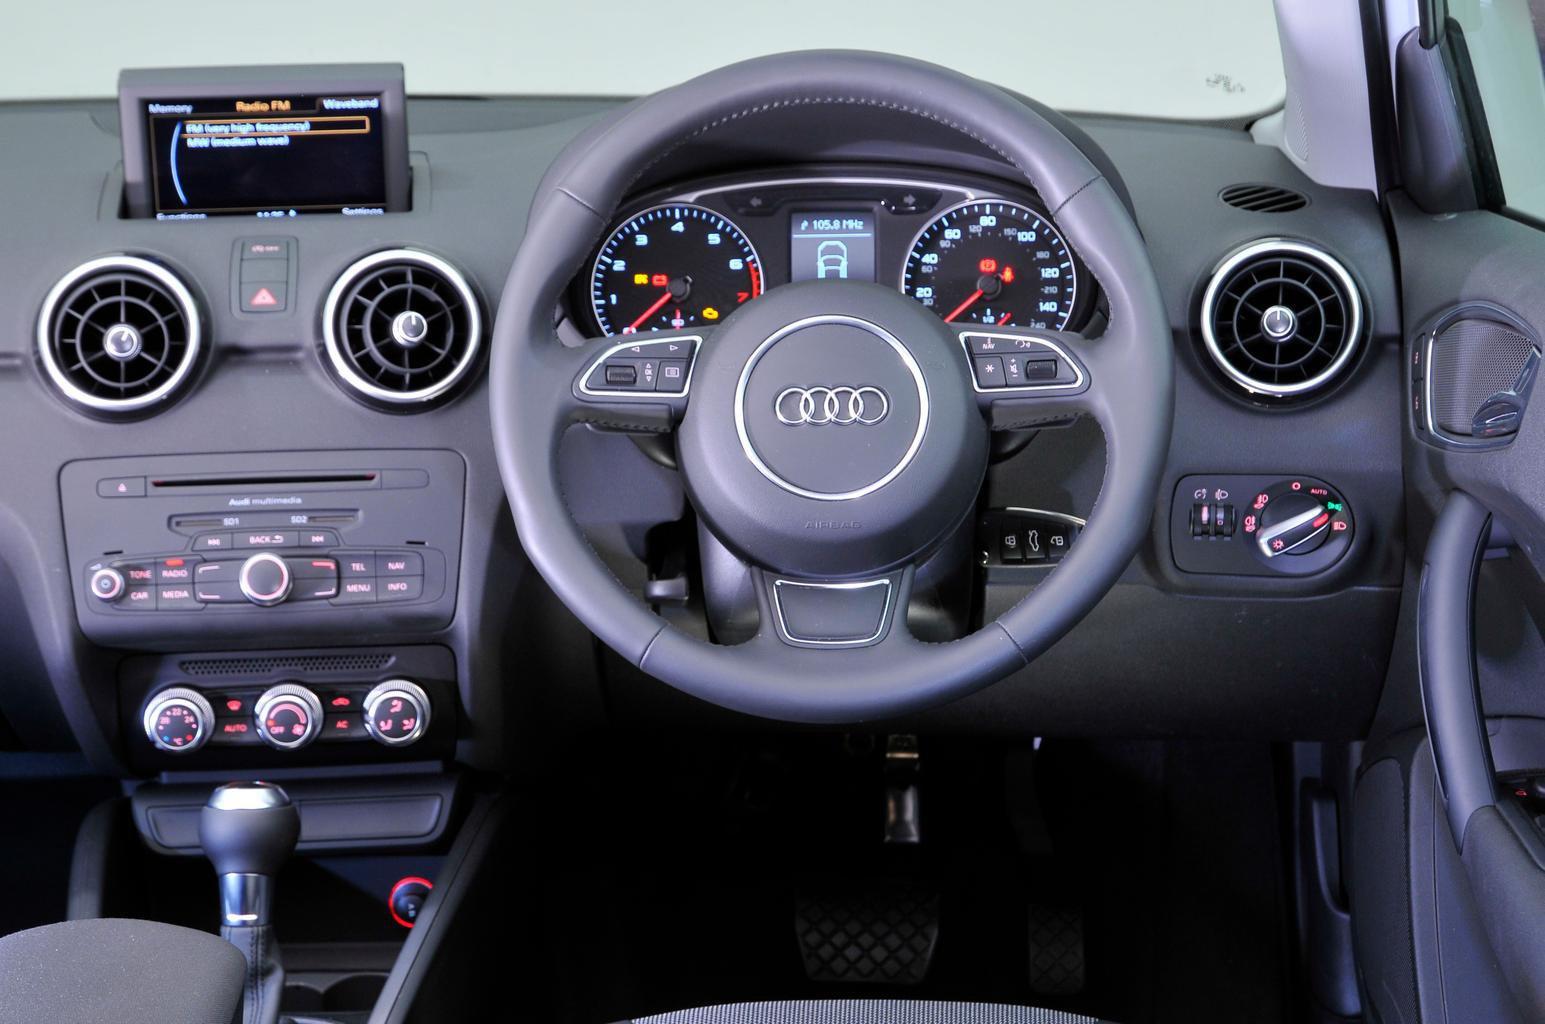 2018 Audi A1 1.4 TFSI Sport auto - interior